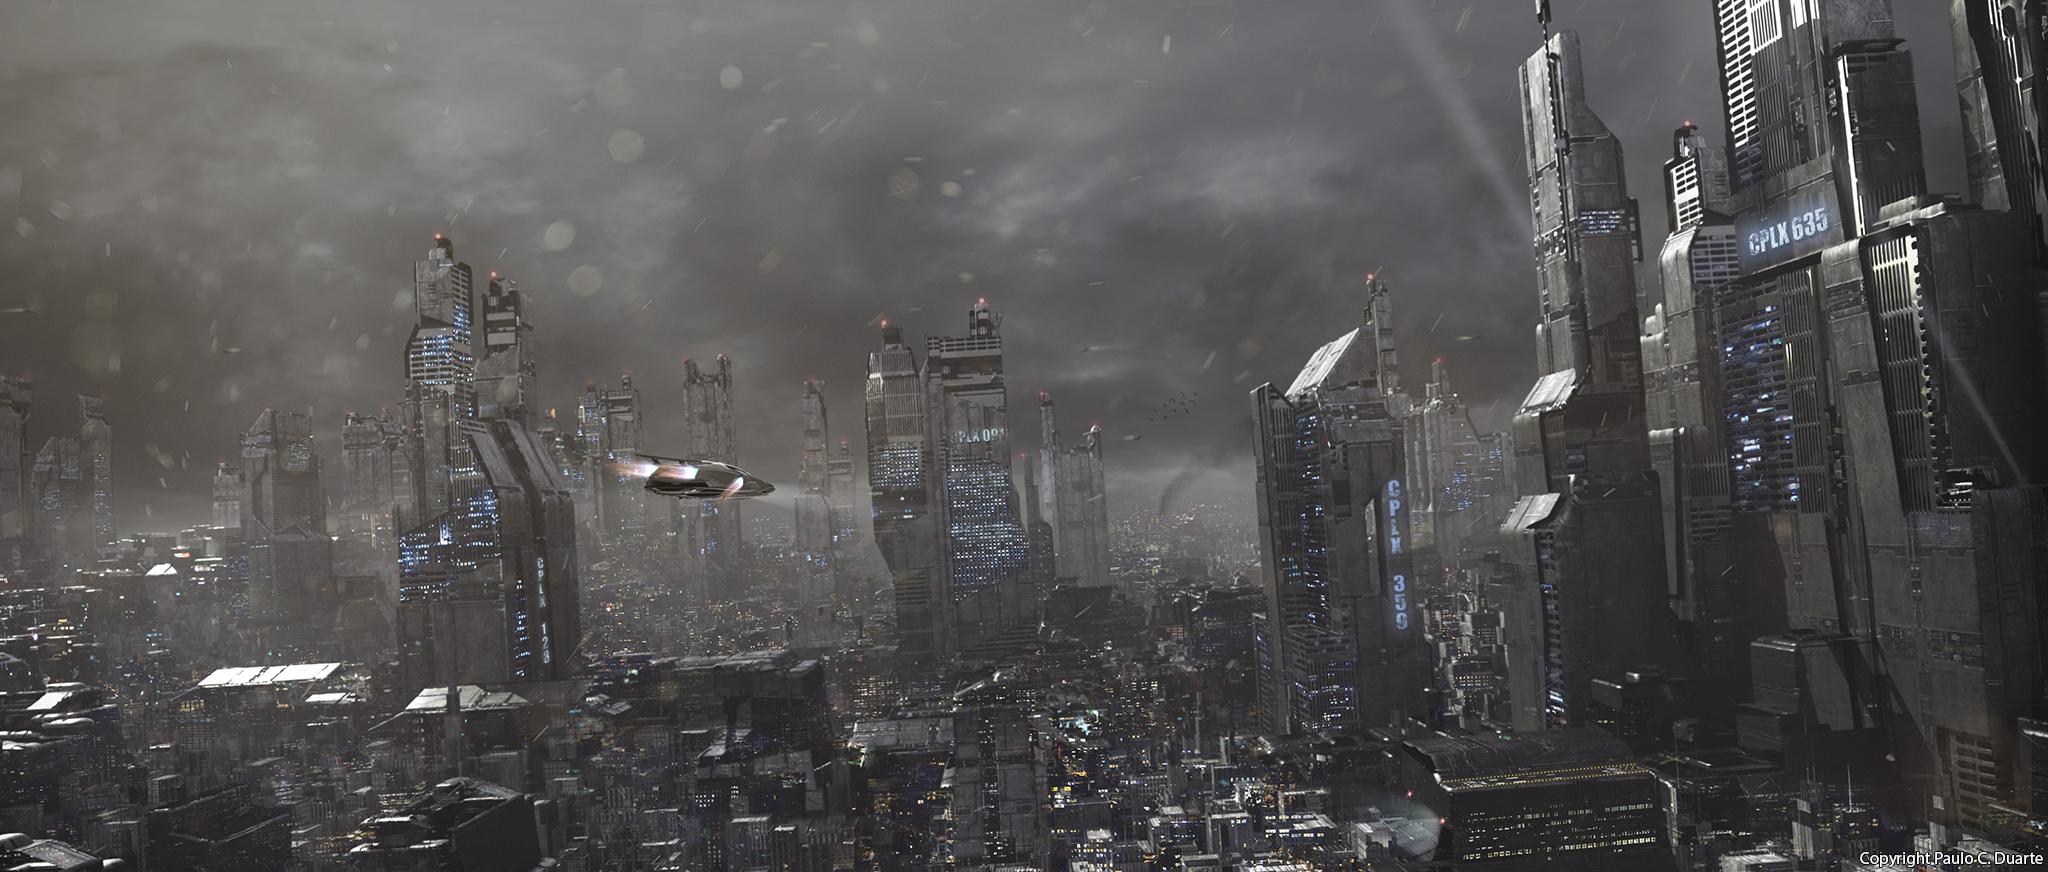 sci-fi_city_concept_001.jpg